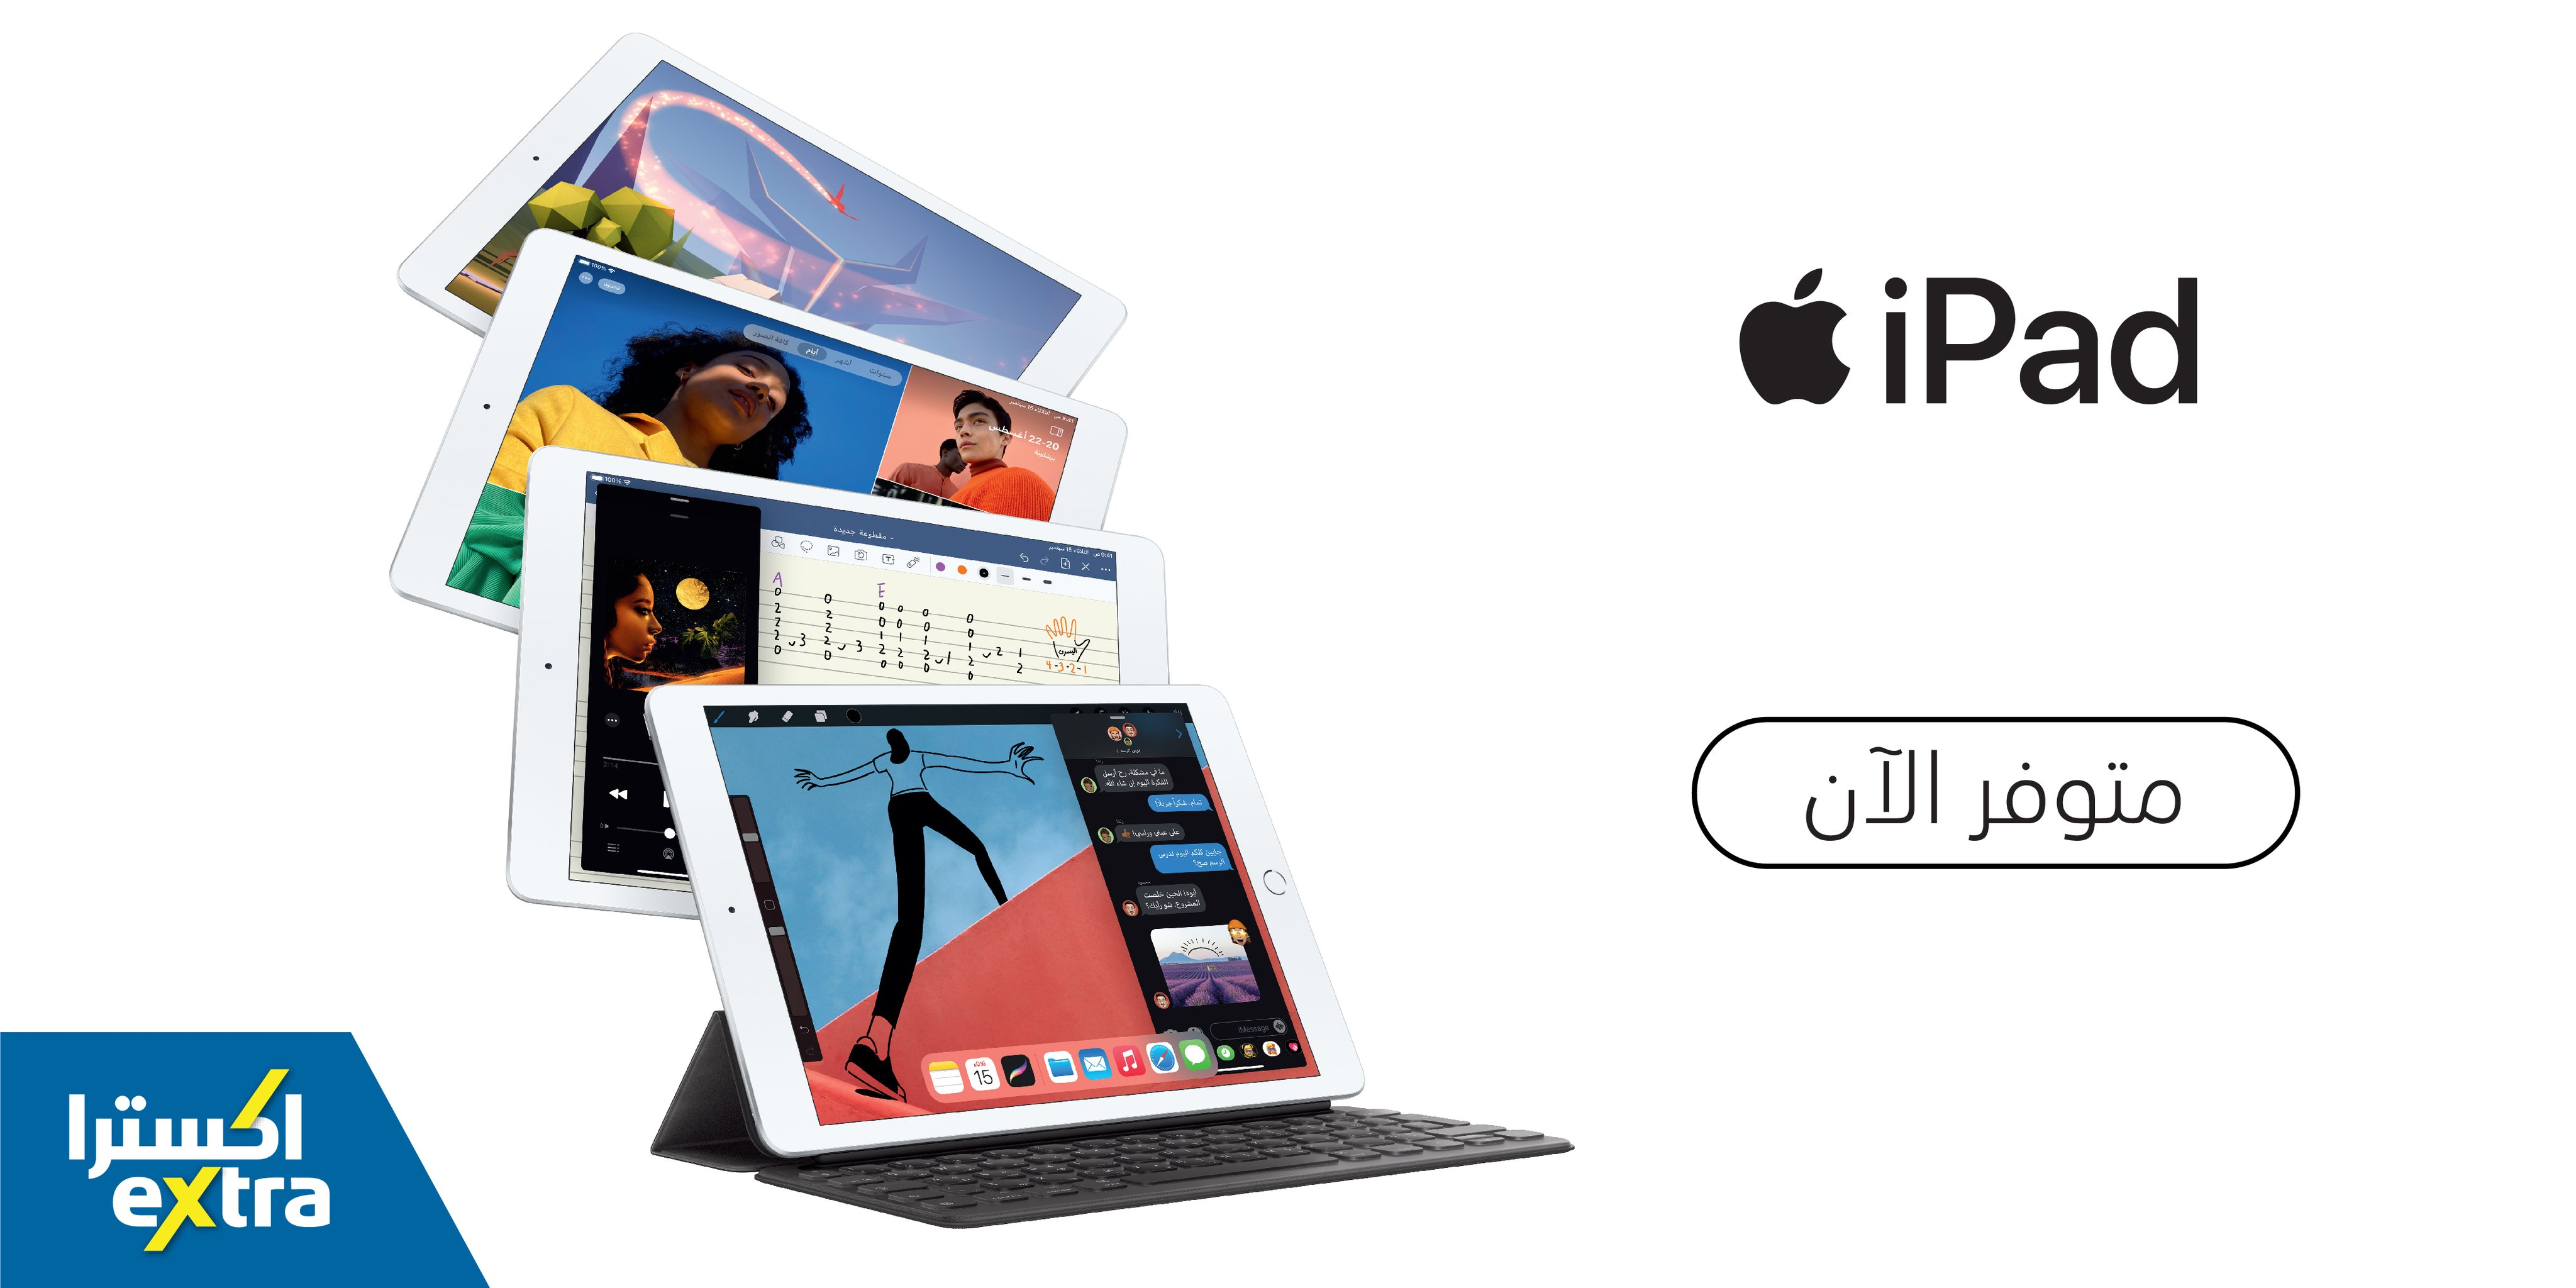 iPad الجديد متوفر الآن لدى اكسترا تسوق عبرإشارة بسبابة اليد للأسفل https://bit.ly/3kE7MgC